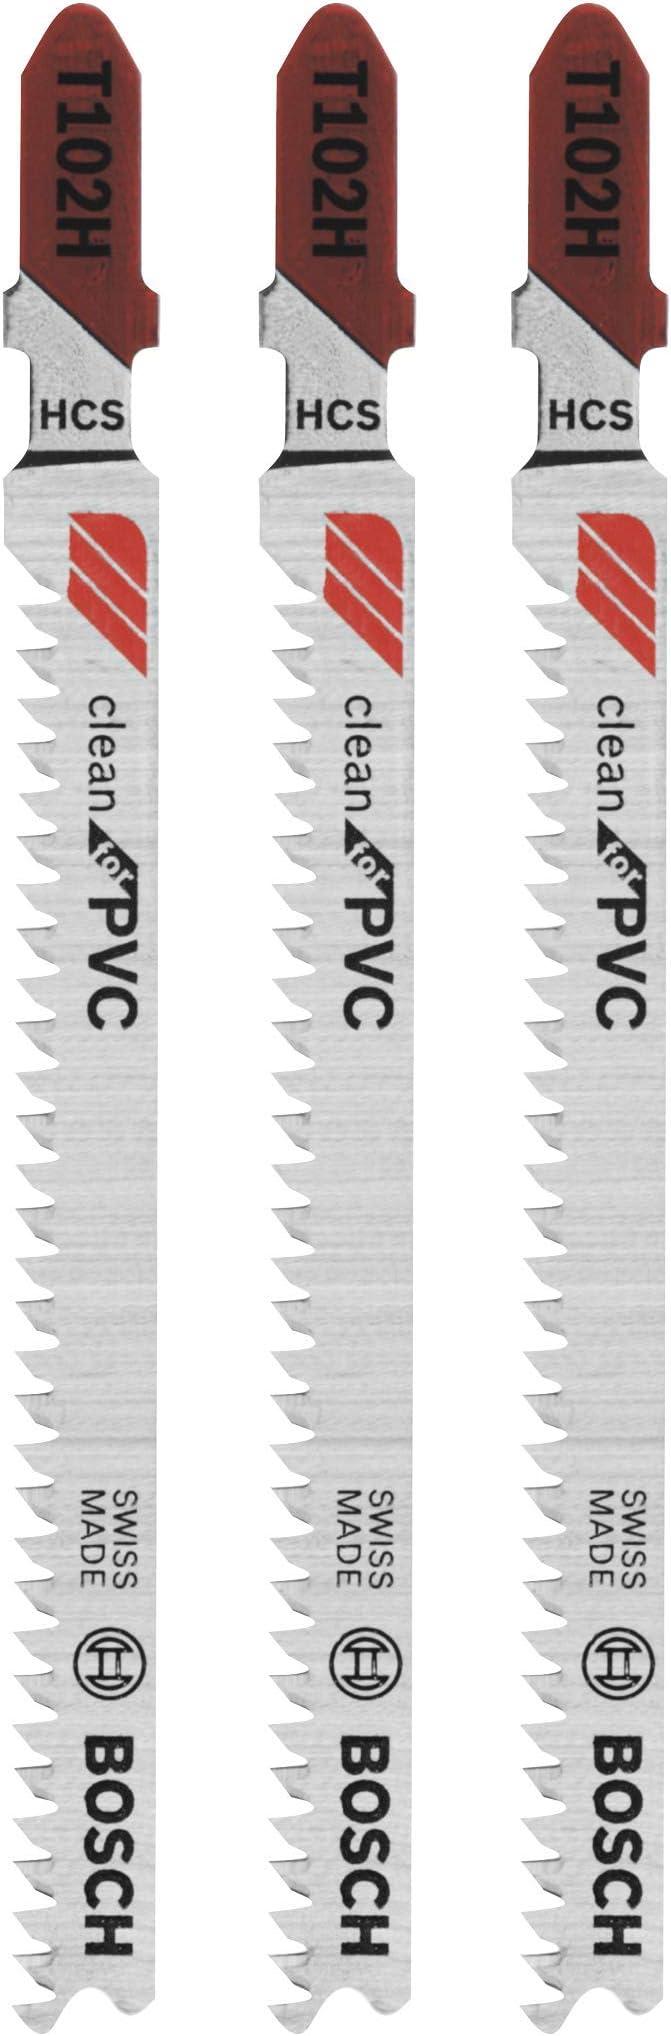 Bosch Jigsaw Blades Saw HCS Wood PVC Bosch Makita Elu Hitachi T111C Switzerland